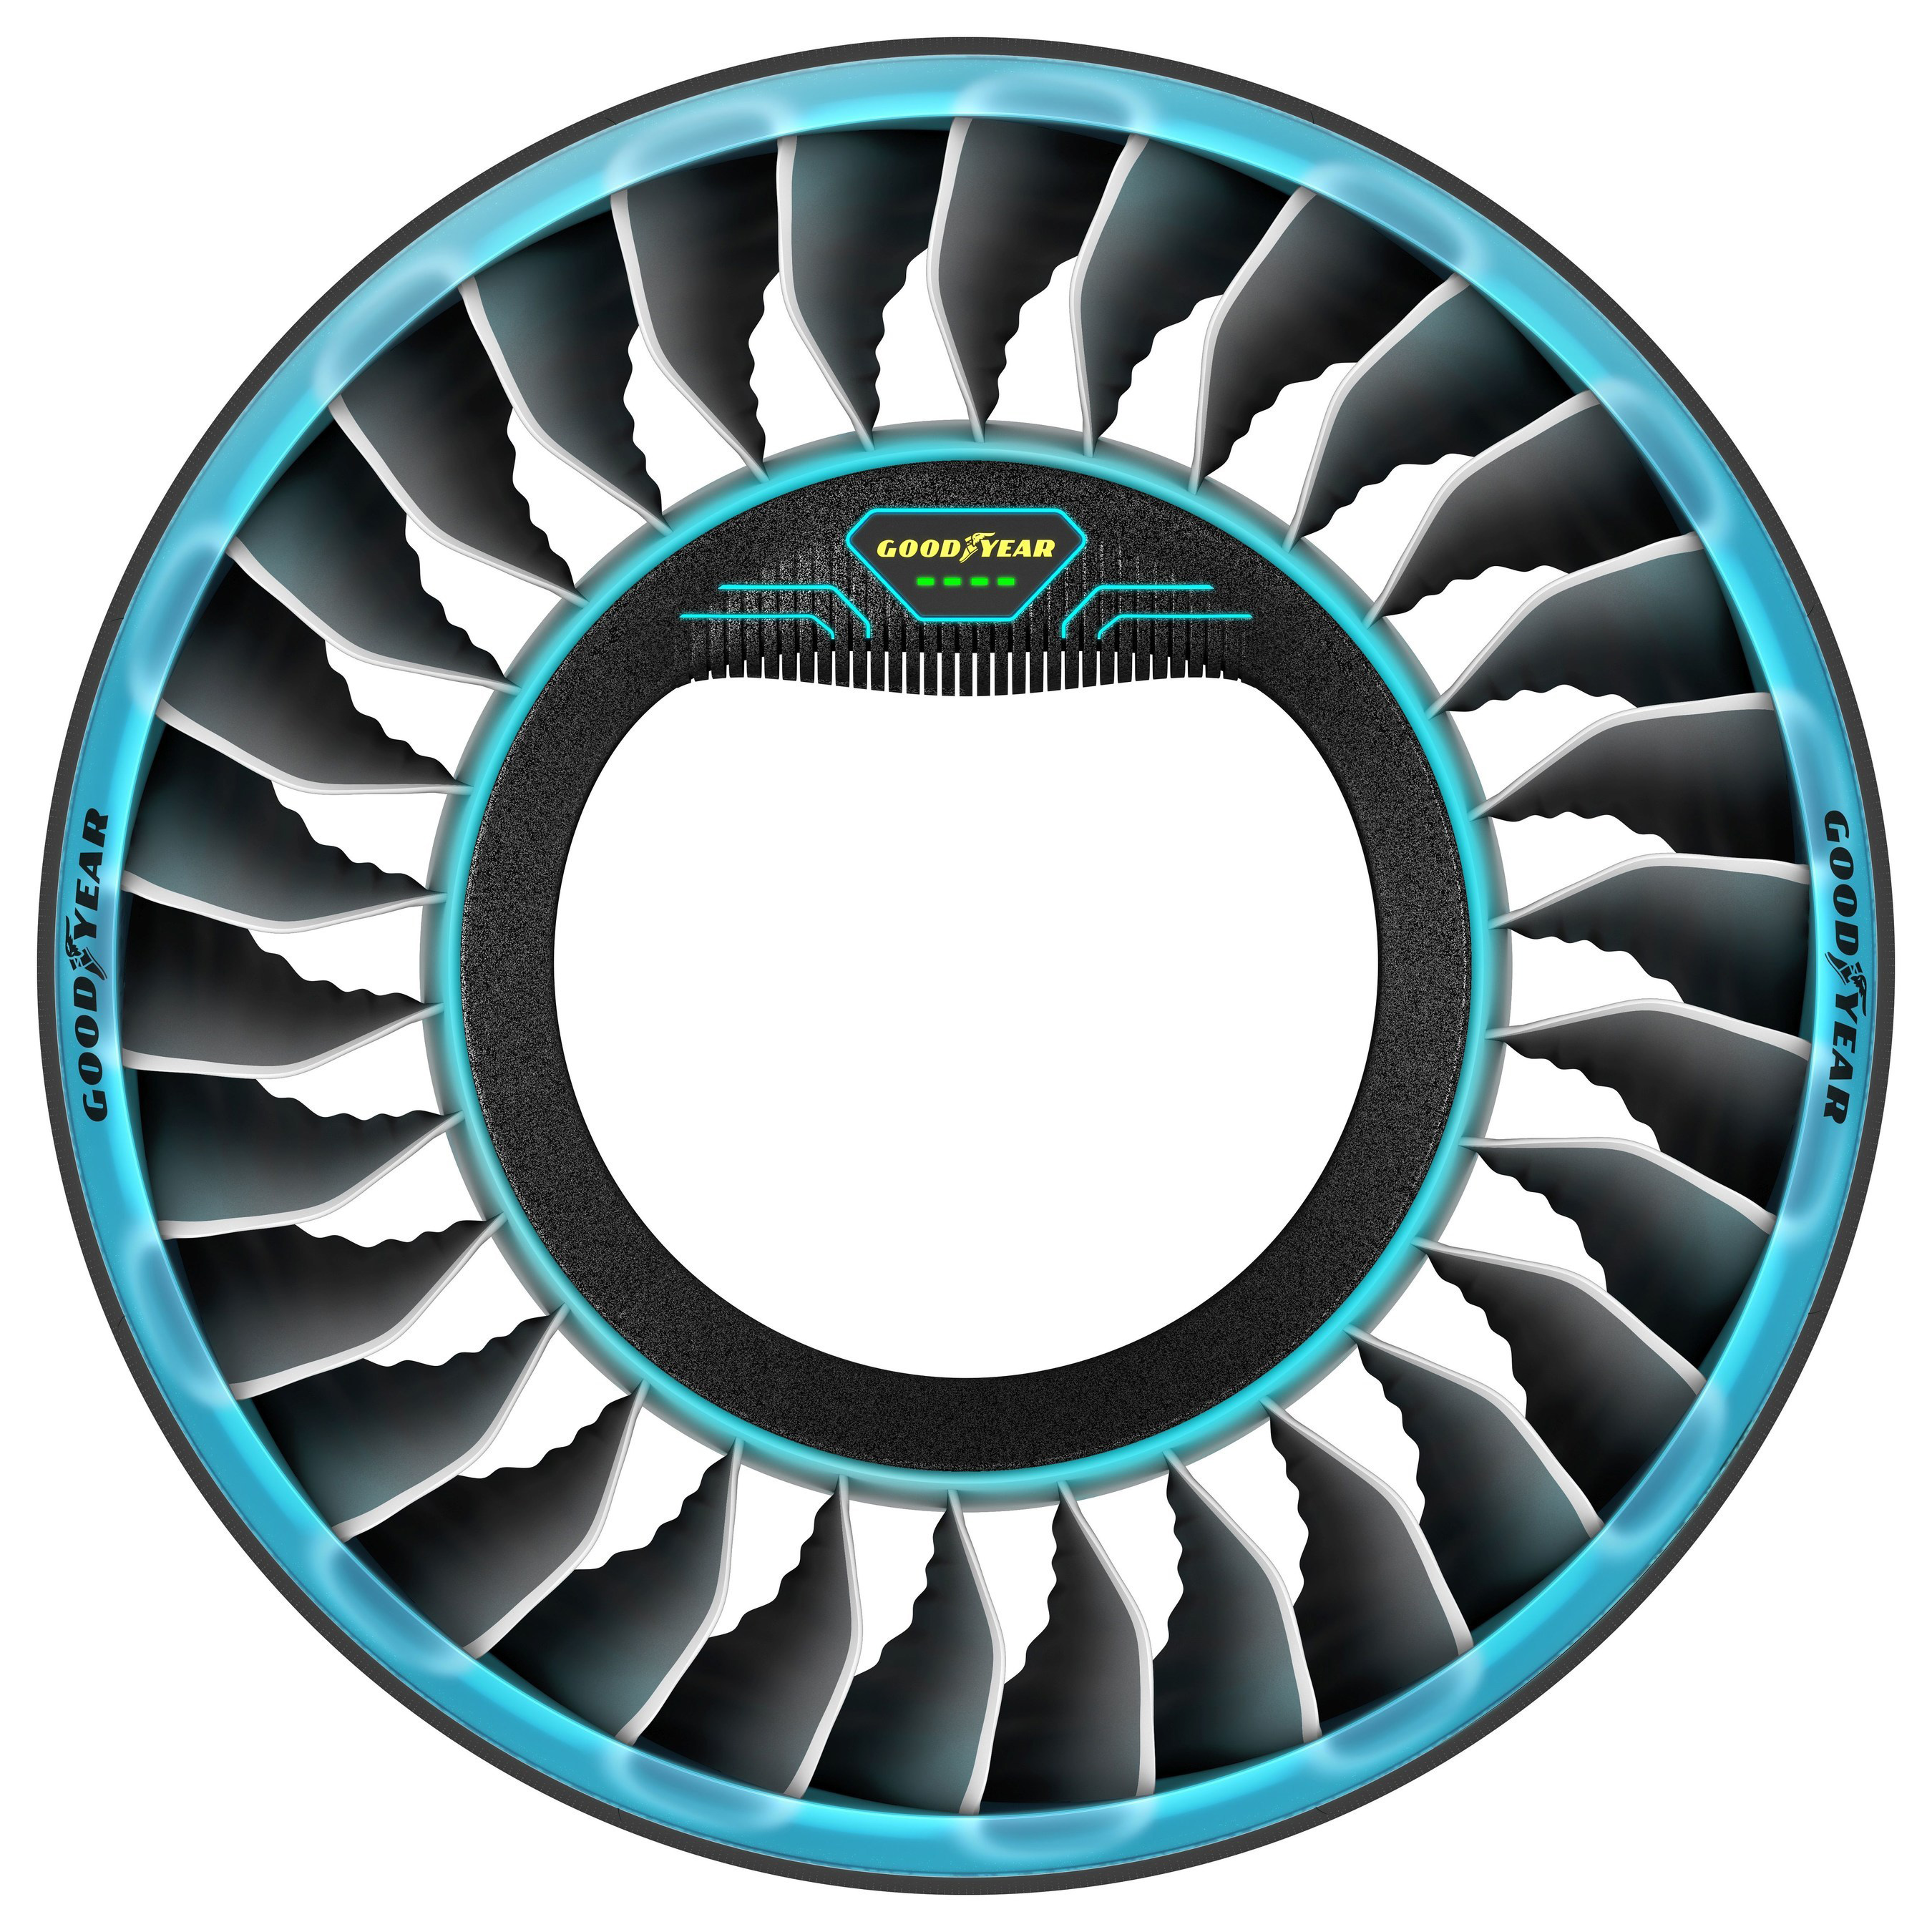 Goodyear Aero Concept Tyre